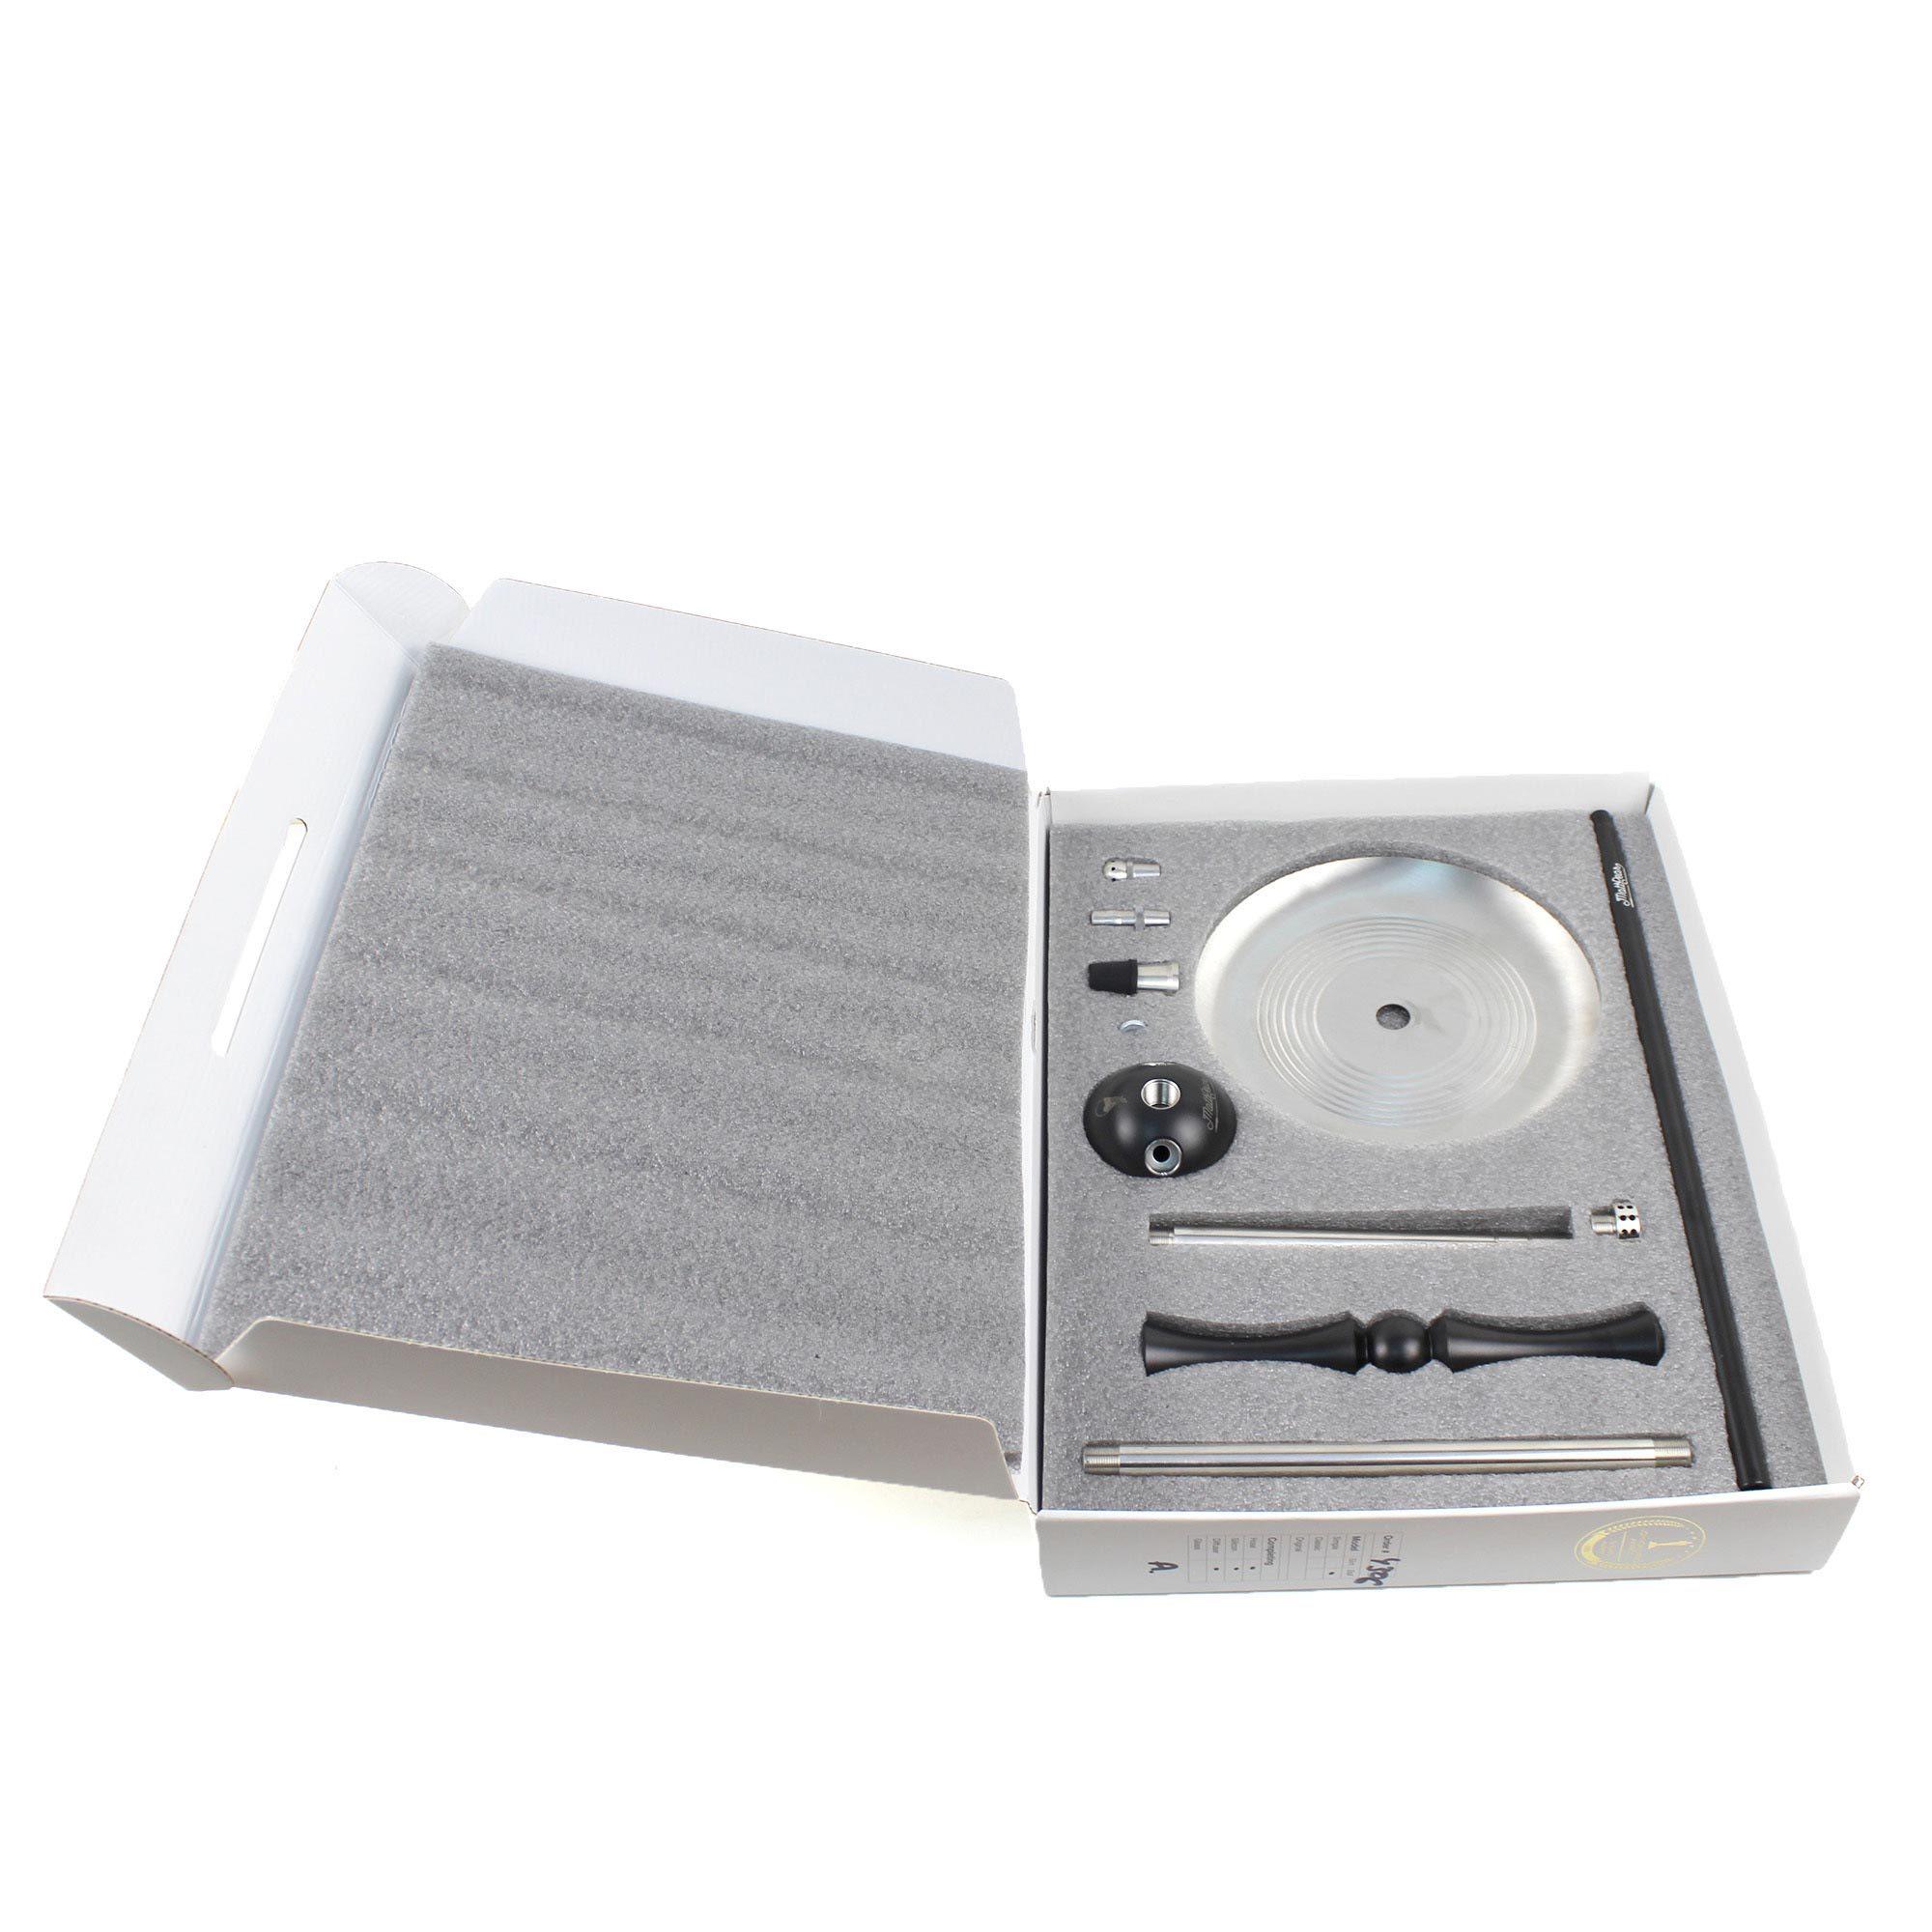 Фирменная коробка с кальяном Mattpear Simple M (Ball)